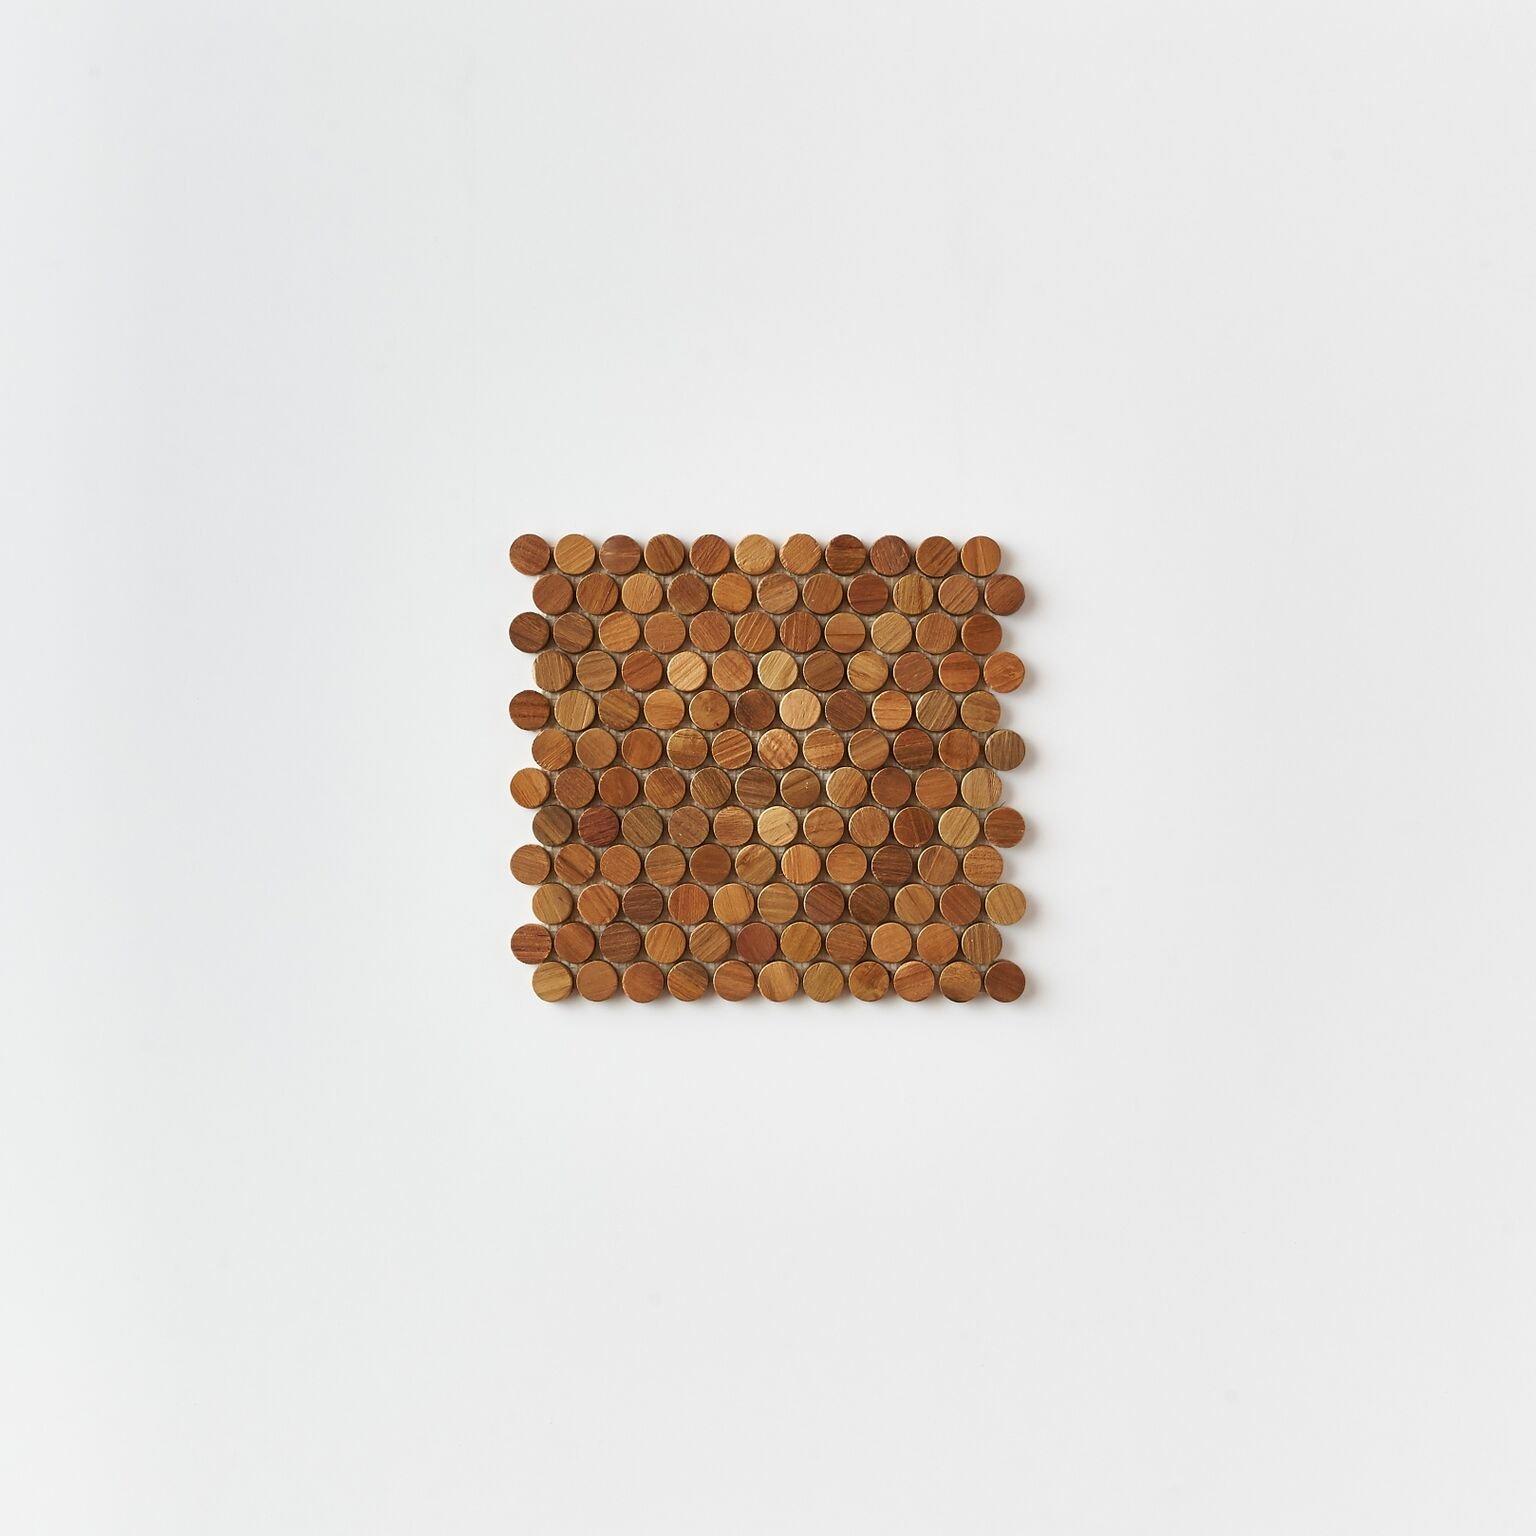 natural single tile 3 - Teak Tile - Bead